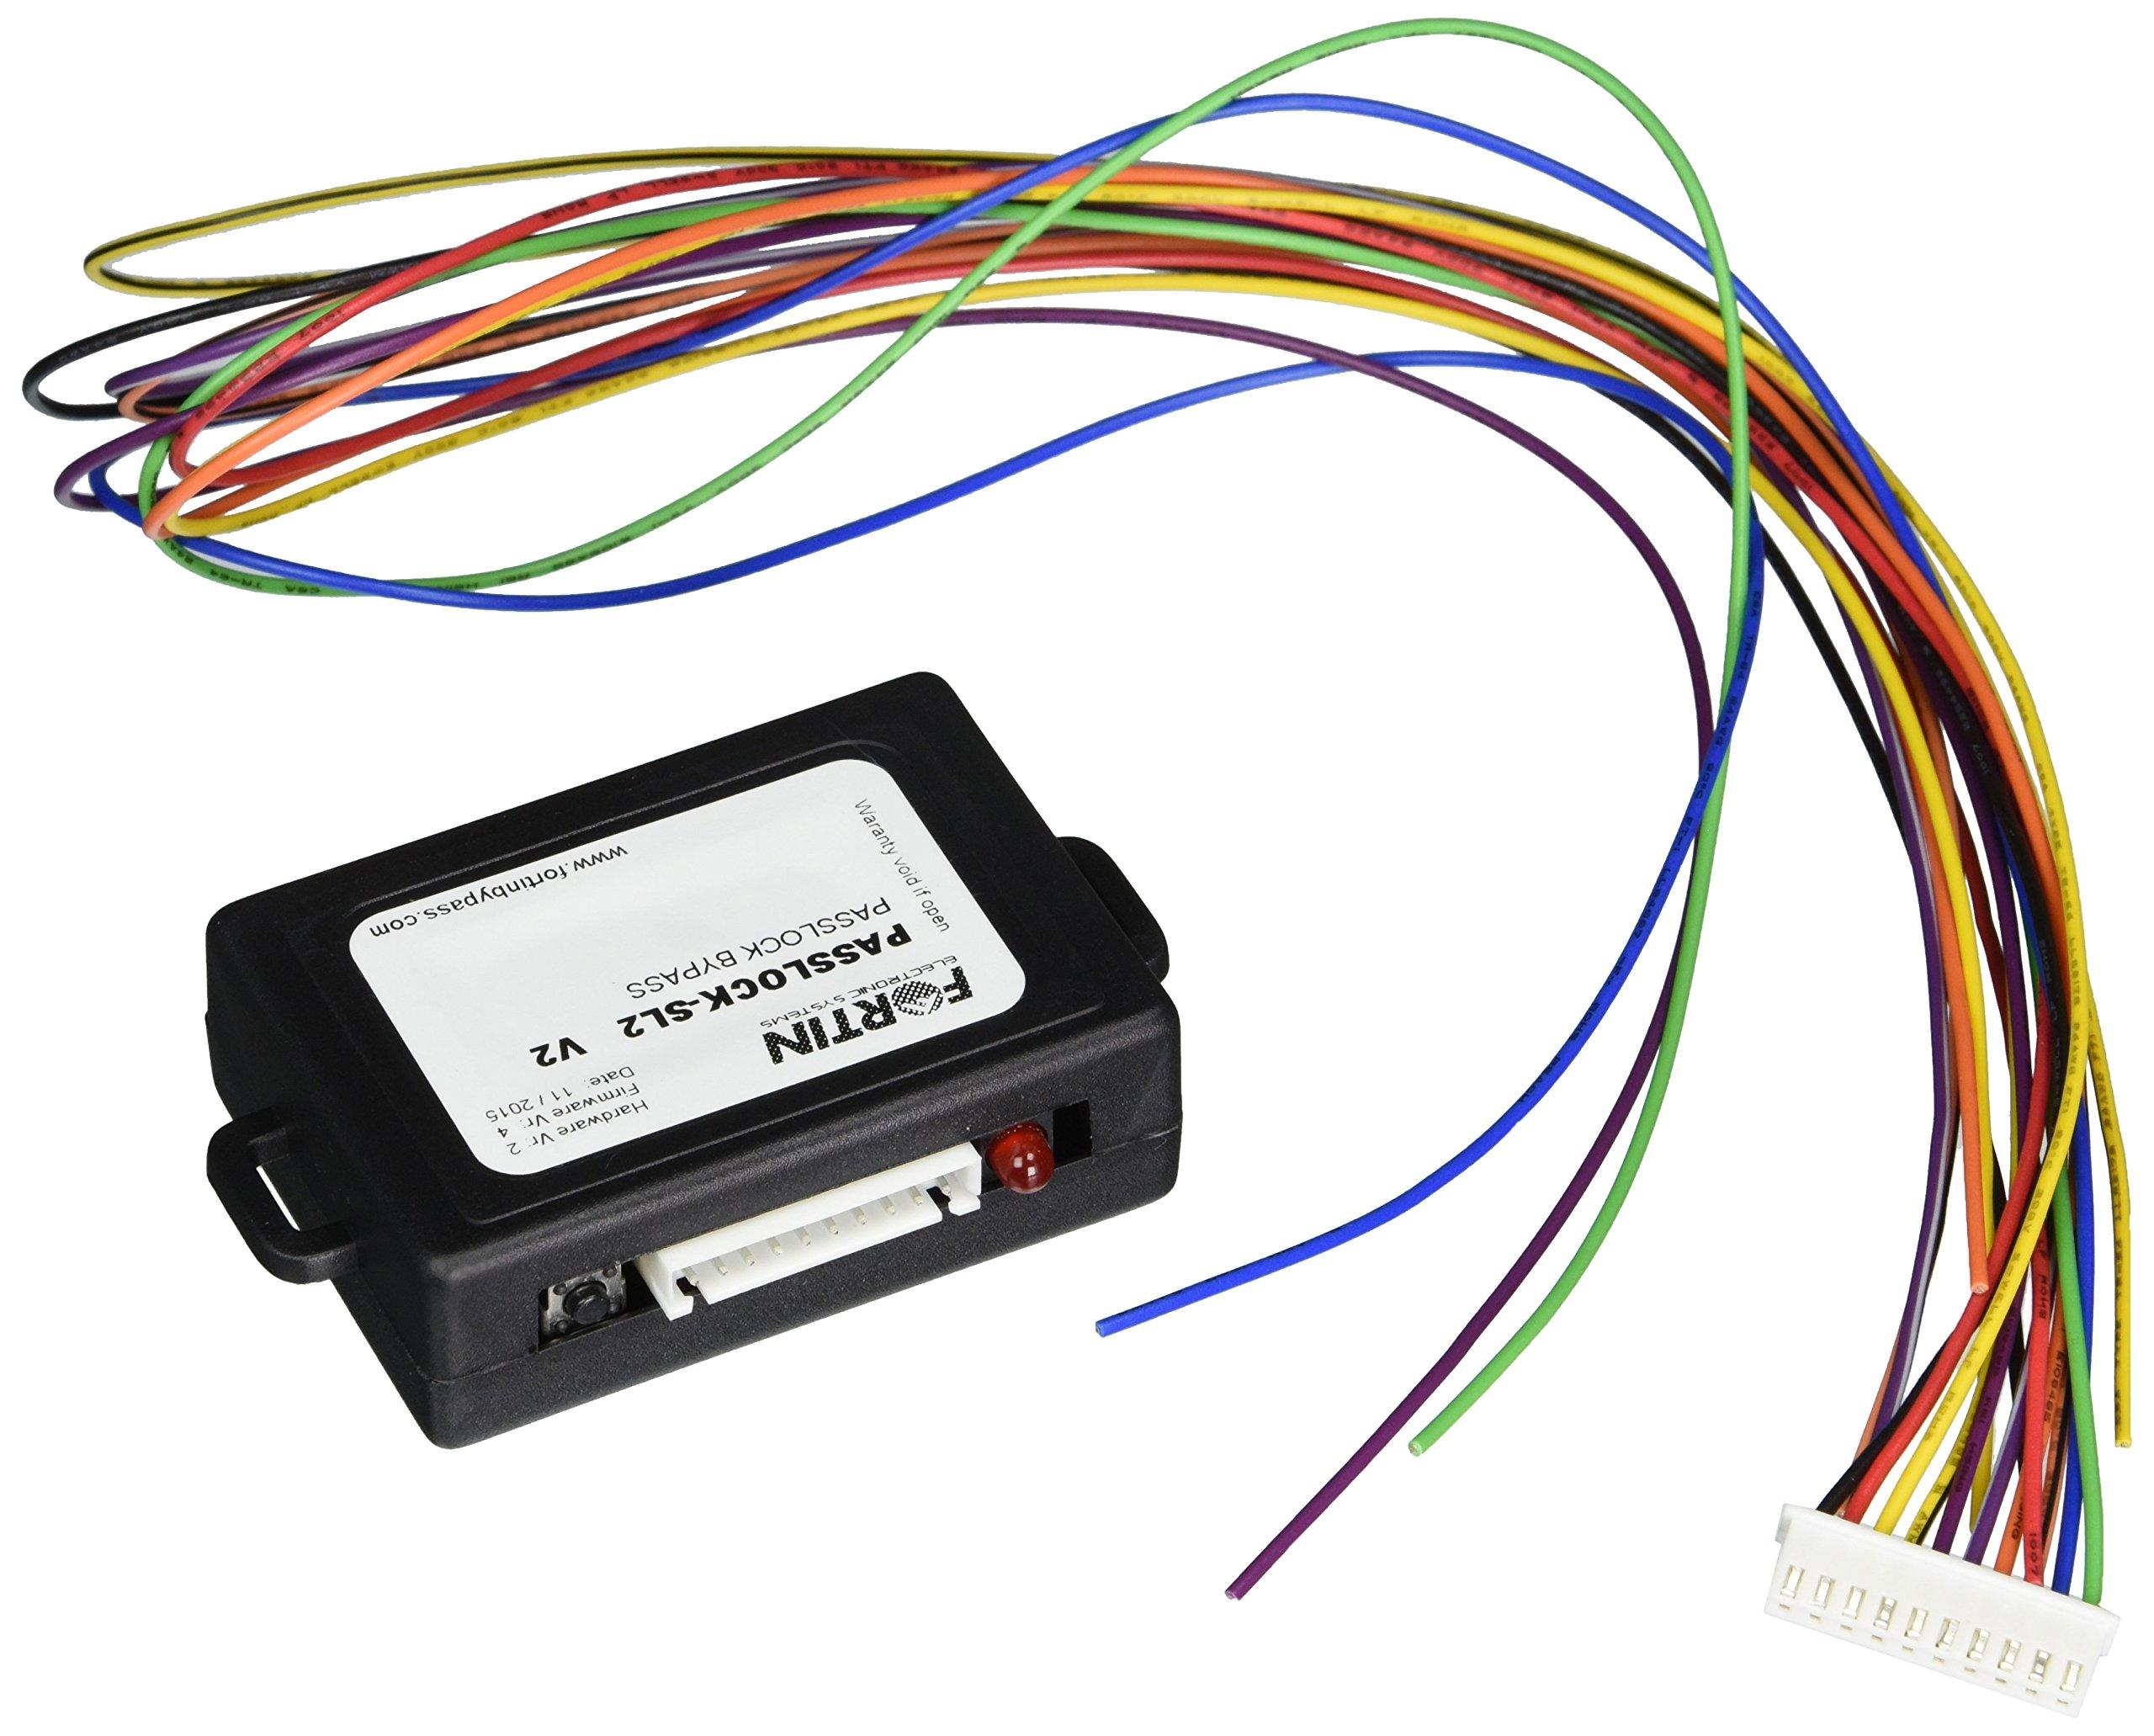 Fortin - PASSLOCK-SL2-V2 - GM Passlock and VATS Transponder Key Bypass Module